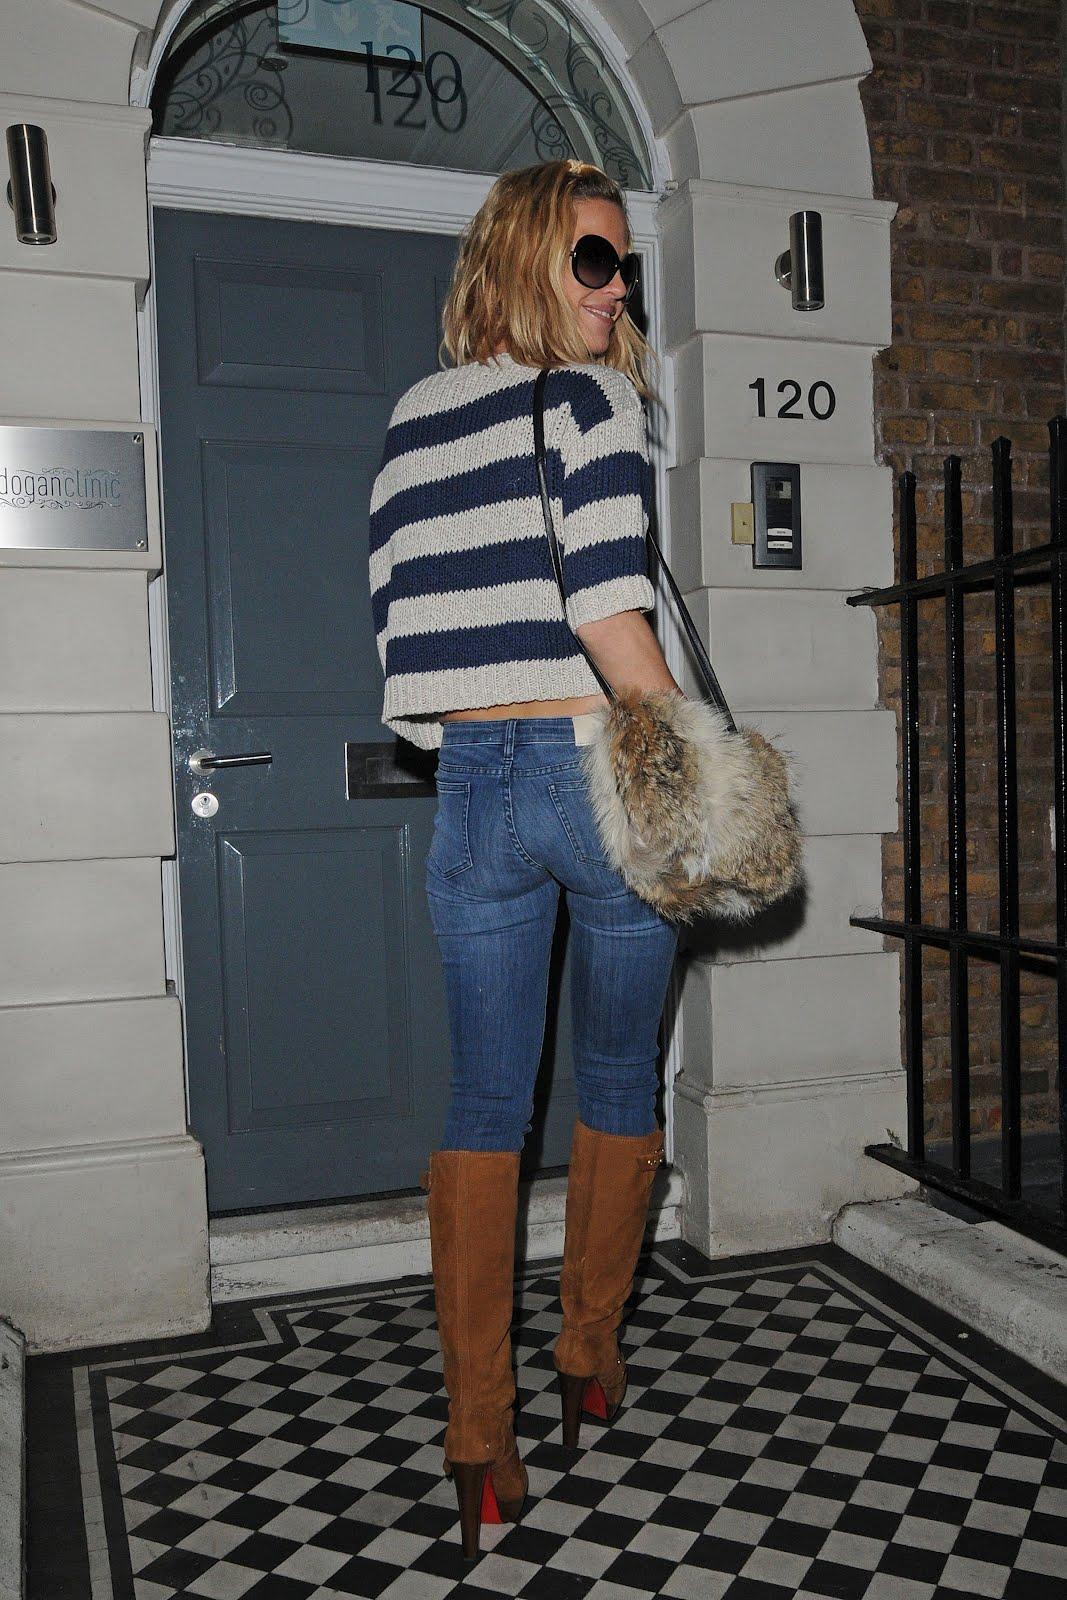 http://1.bp.blogspot.com/-z0Xeqlj30yM/TzENiAKVicI/AAAAAAAAJes/YpUDTmPv82o/s1600/sploogeblog_sarah_harding_croptop_jeans_kneeboots_candids_01.jpg